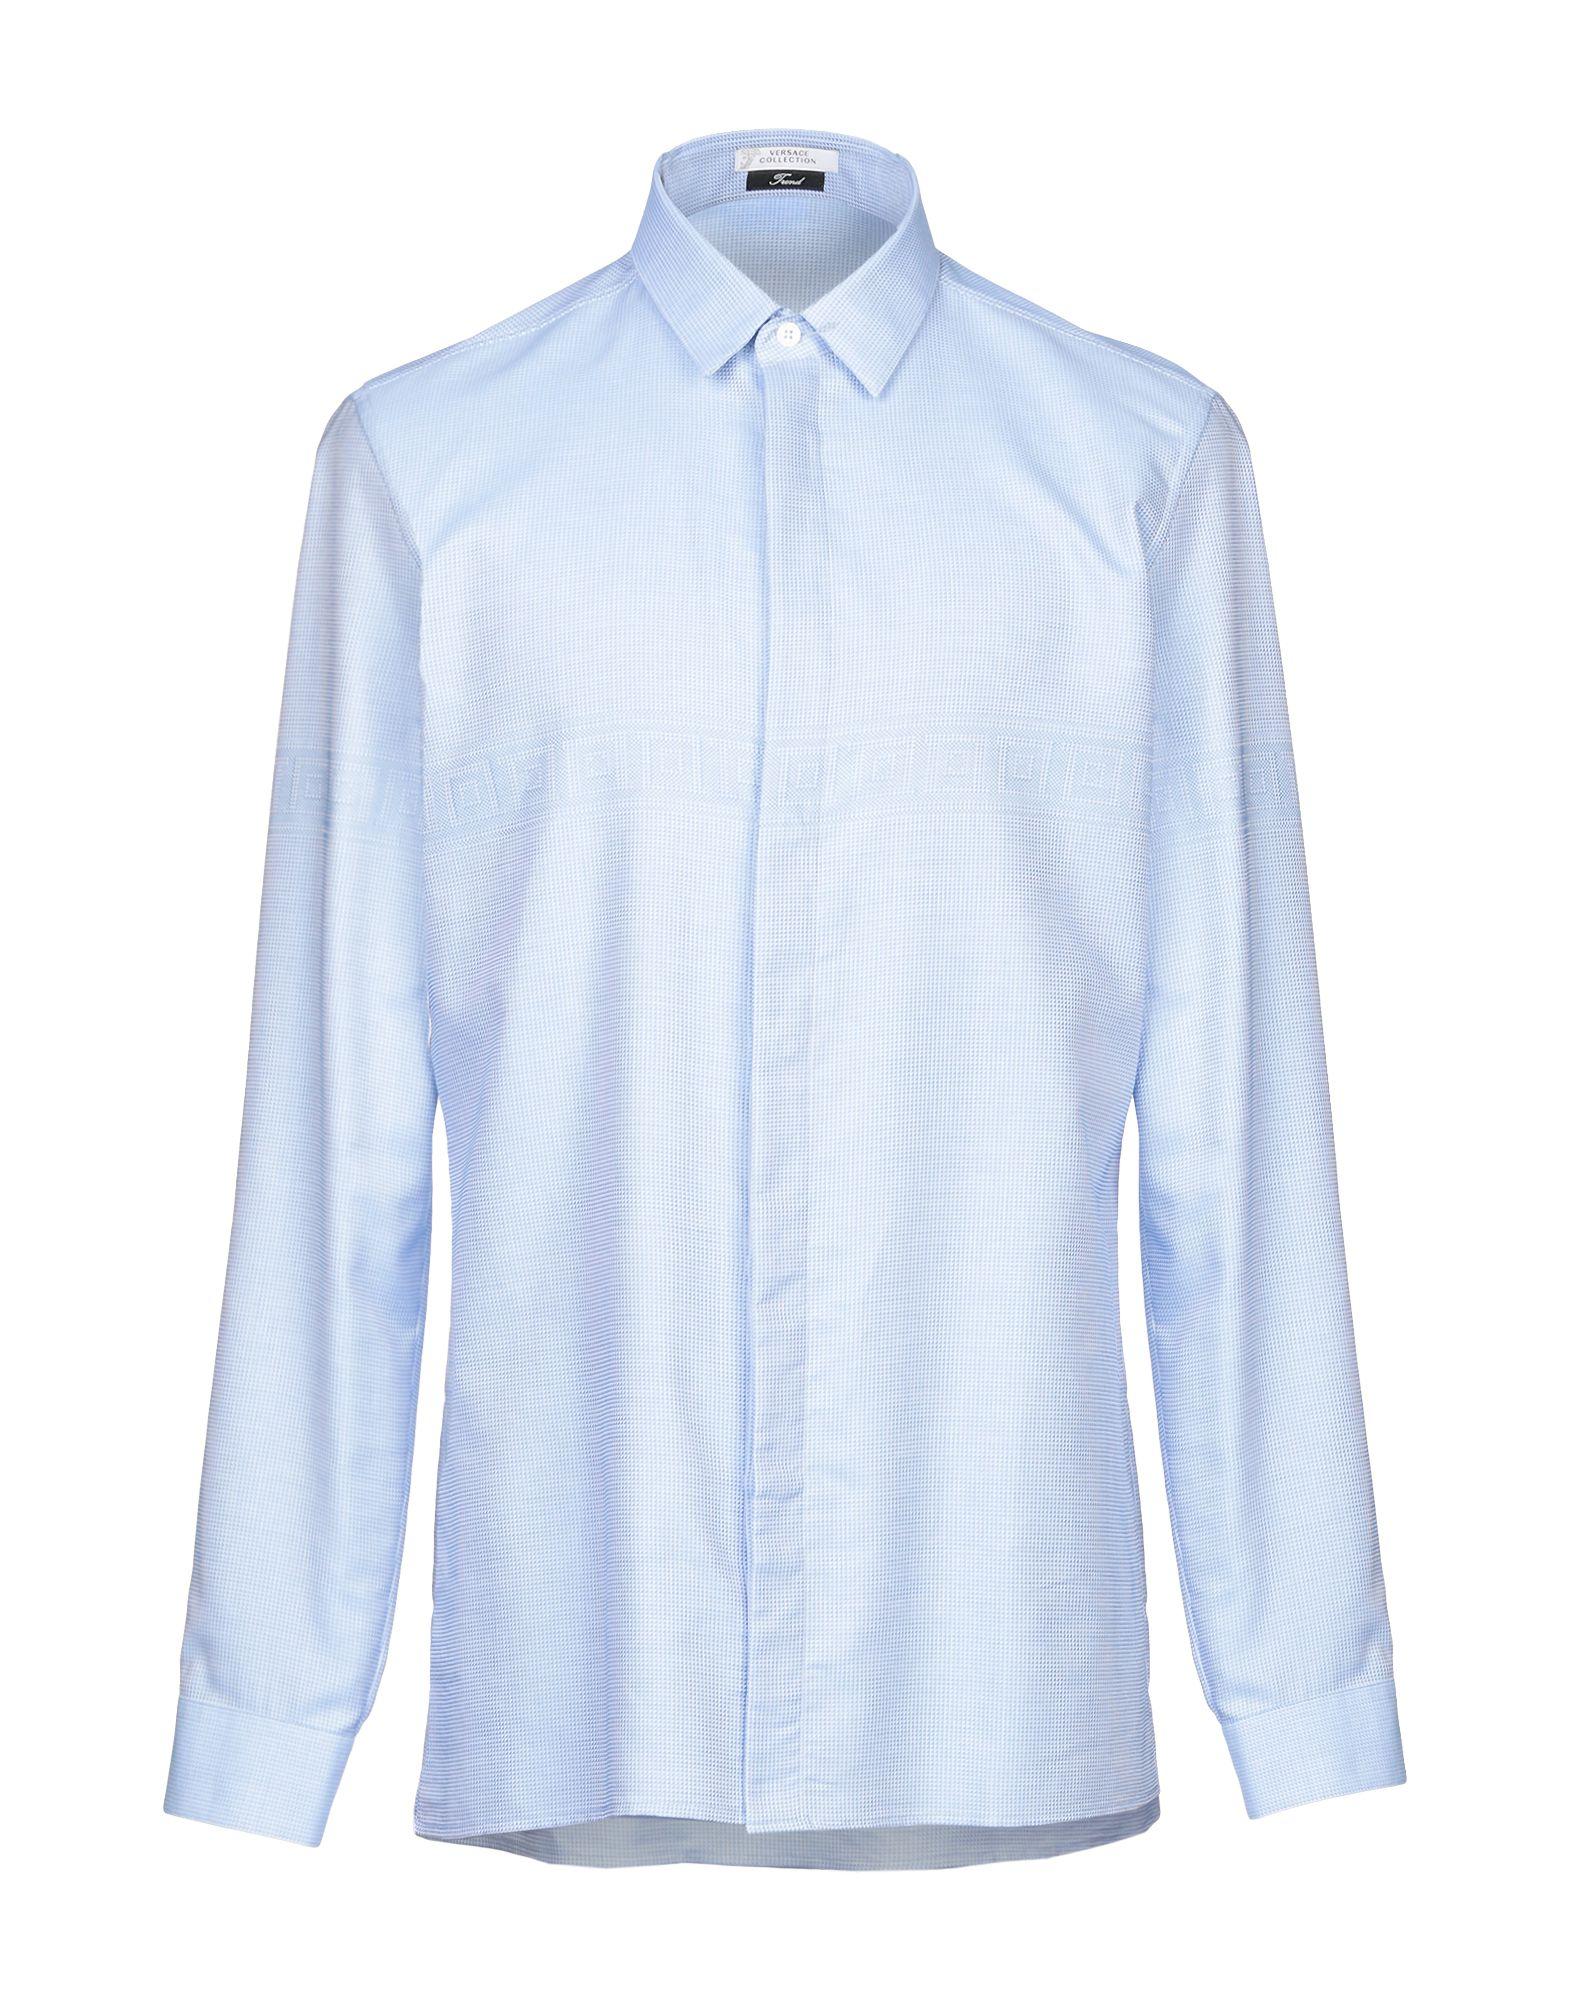 Camicia Camicia Camicia Fantasia Versace Collection uomo - 38852071LU 435